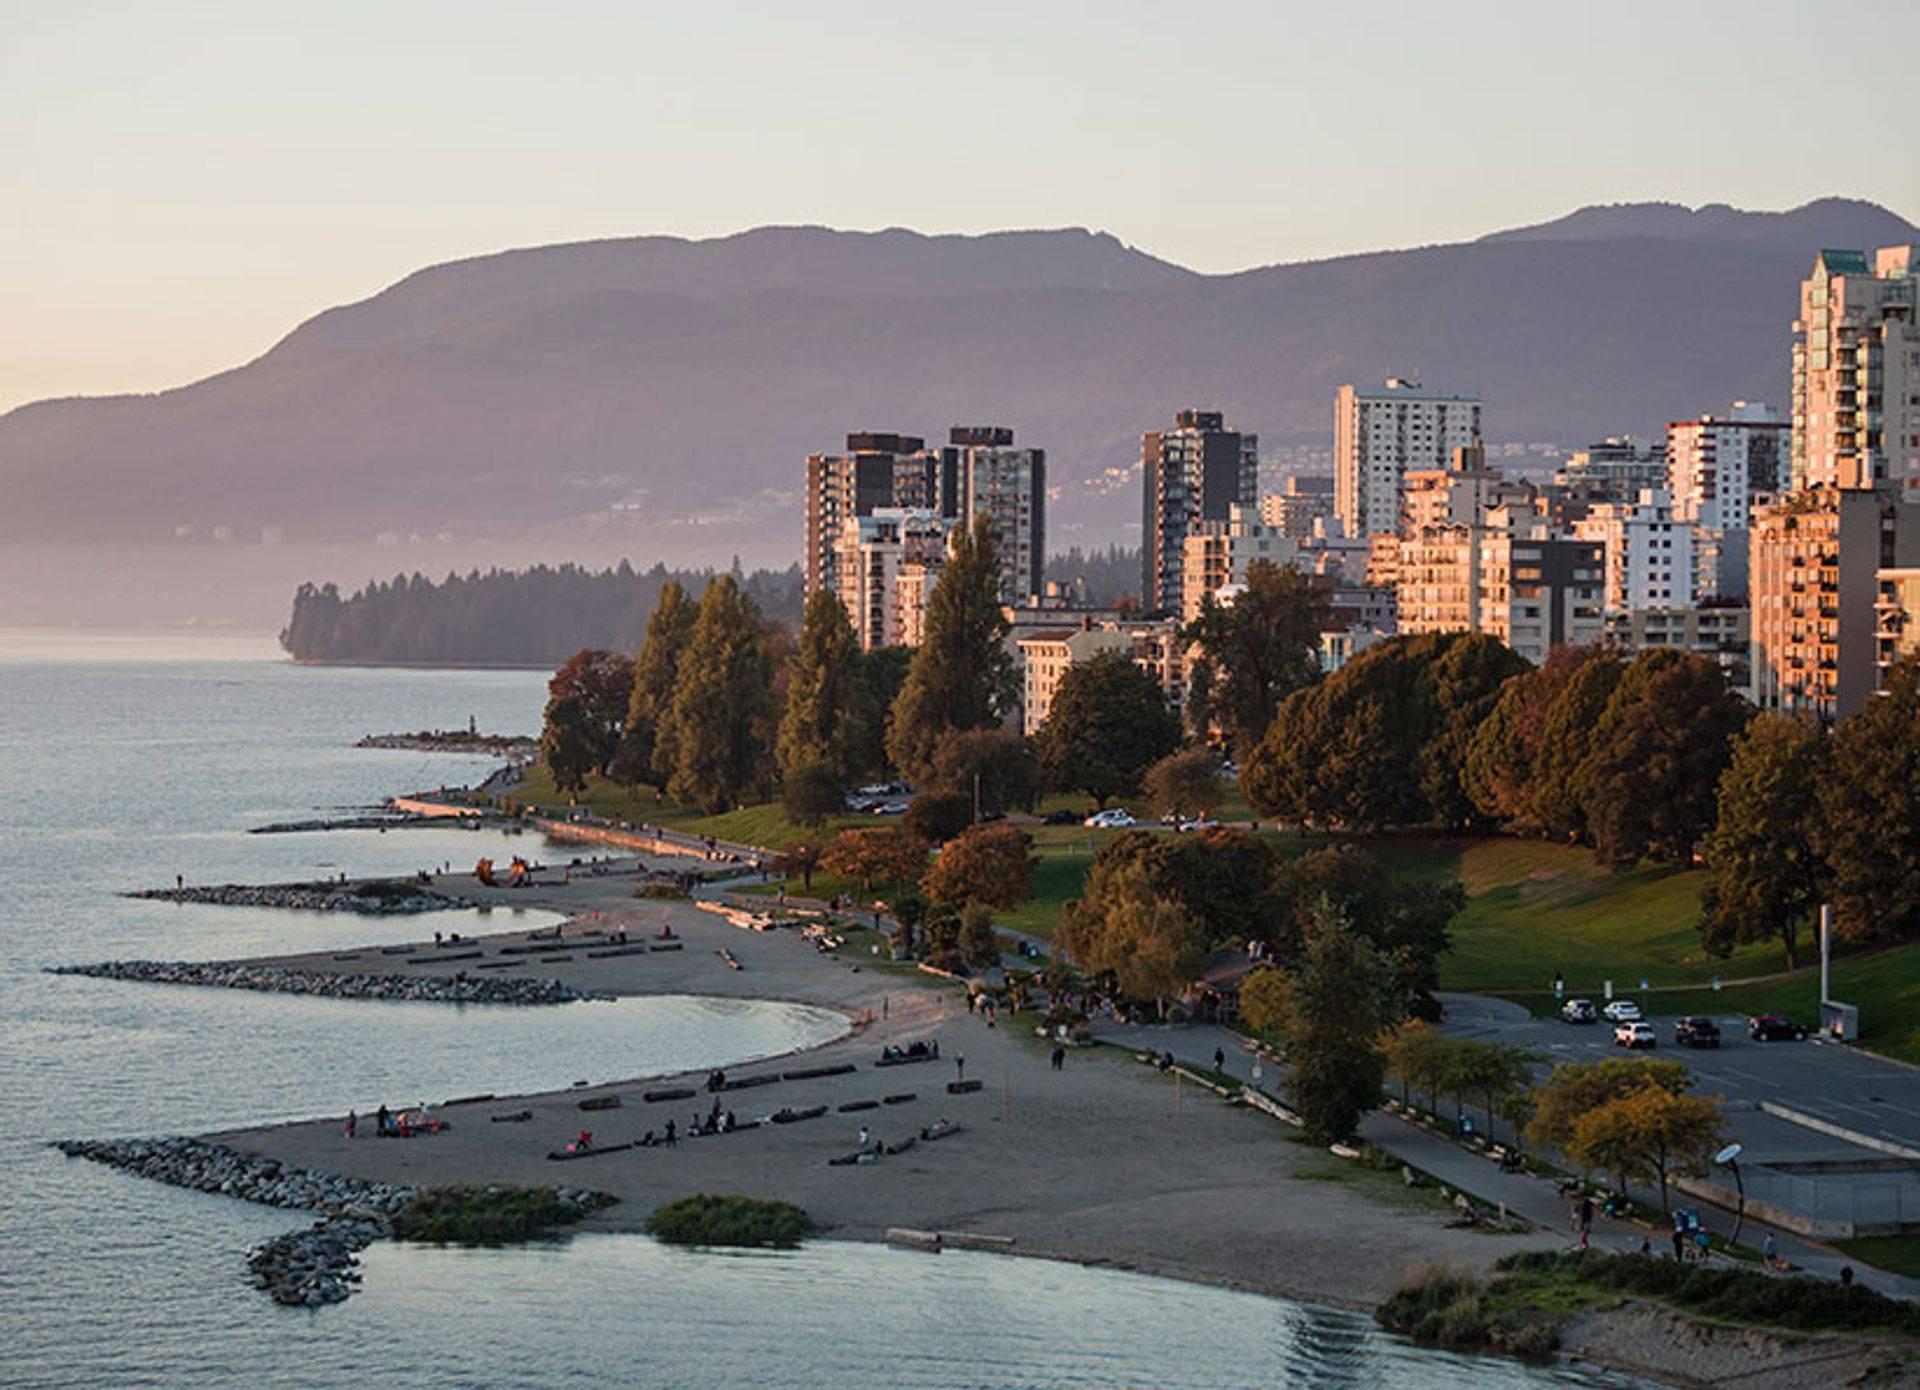 West End Dentist Vancouver, BC